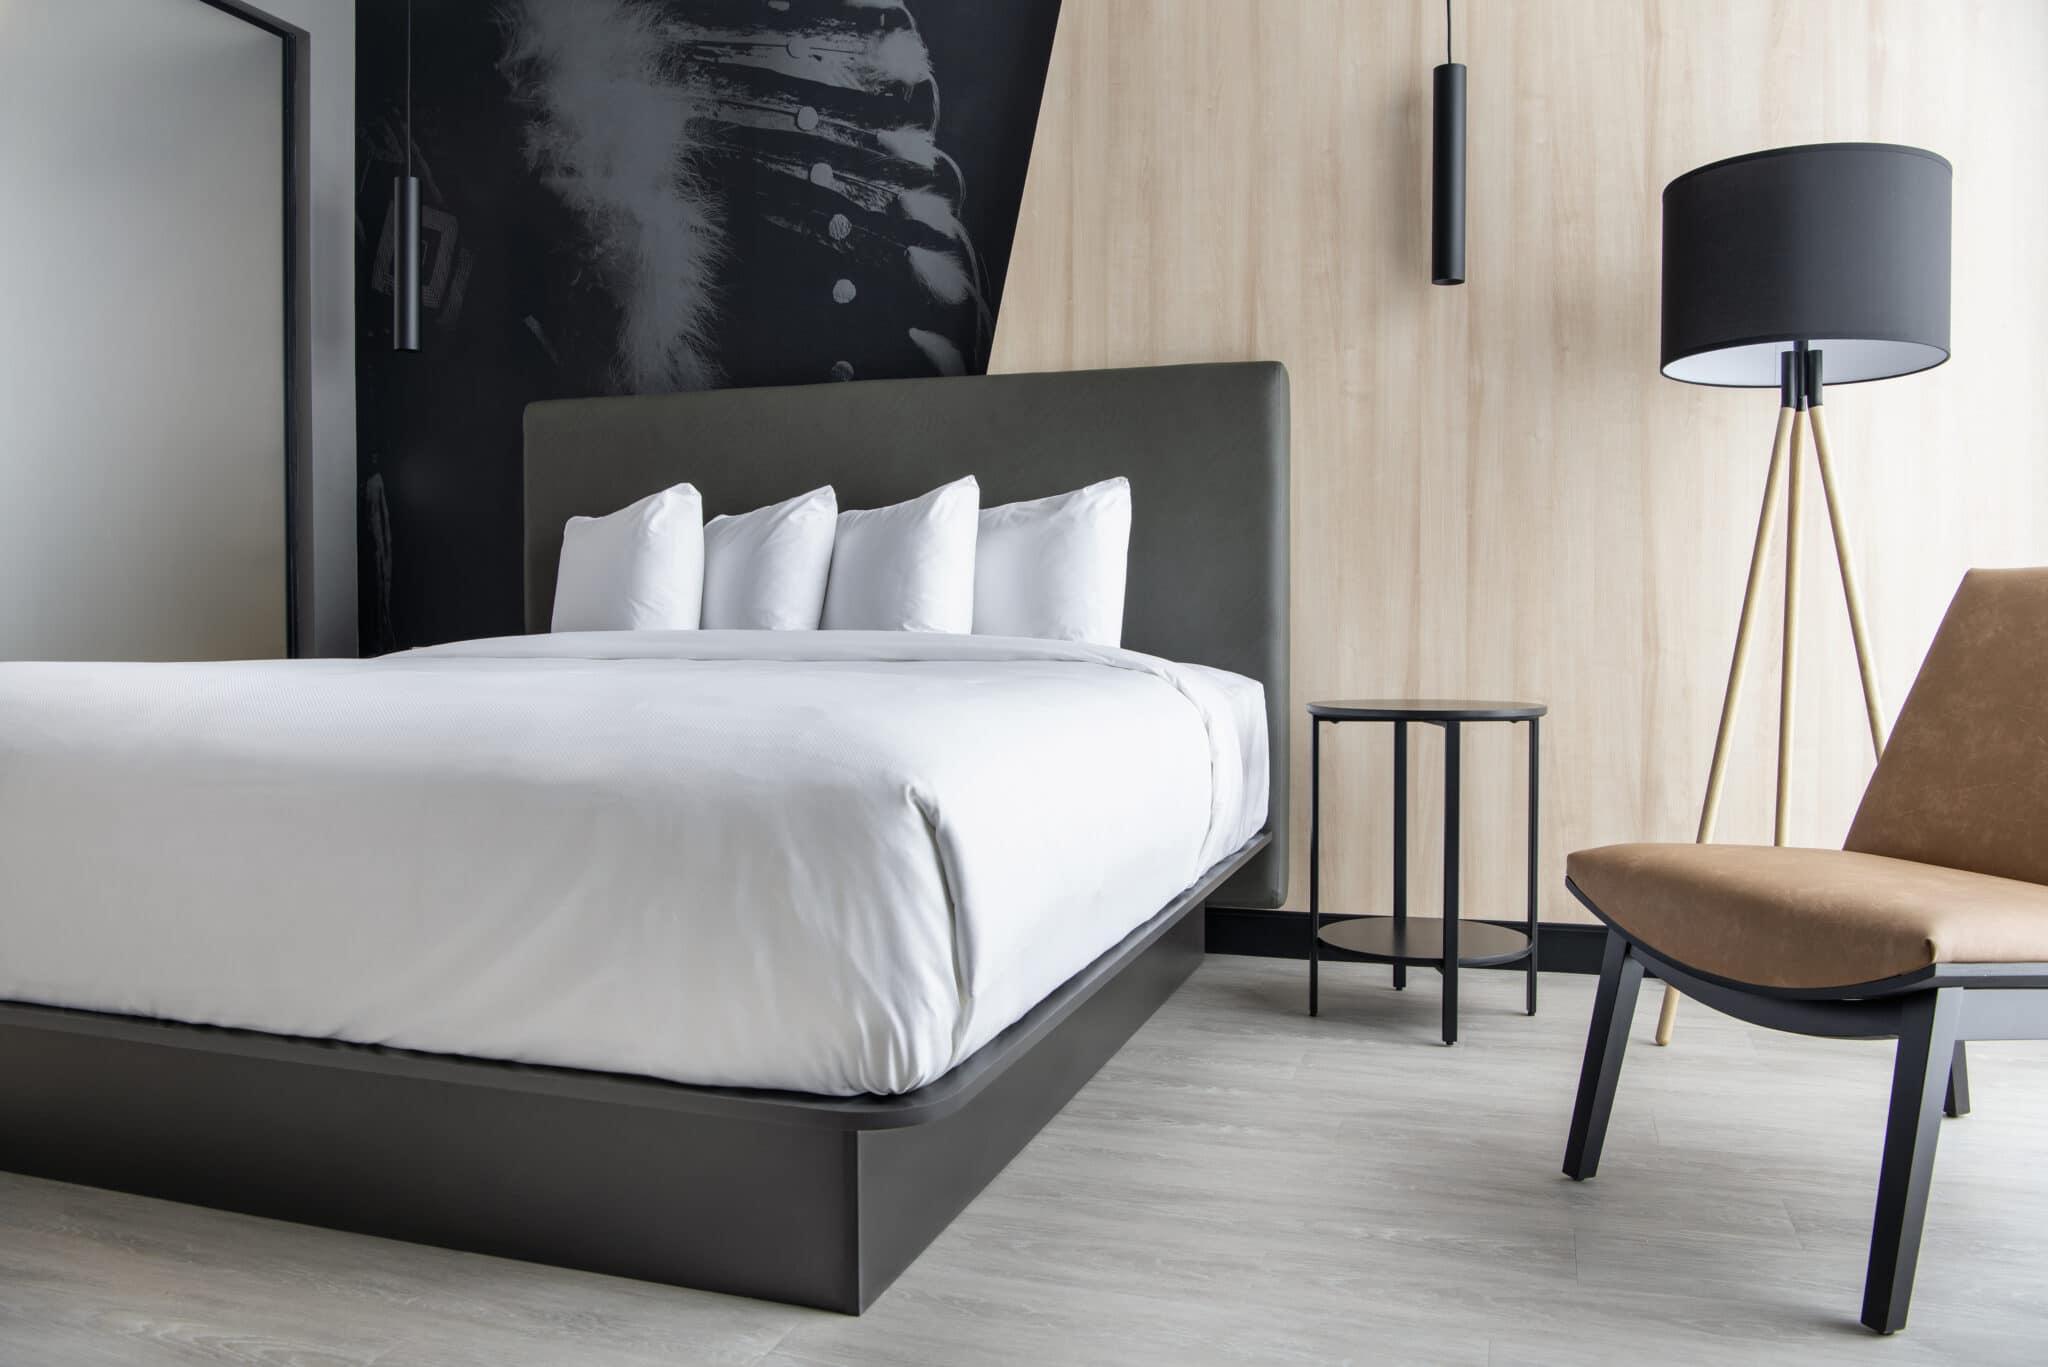 Dakotadunes King Bed